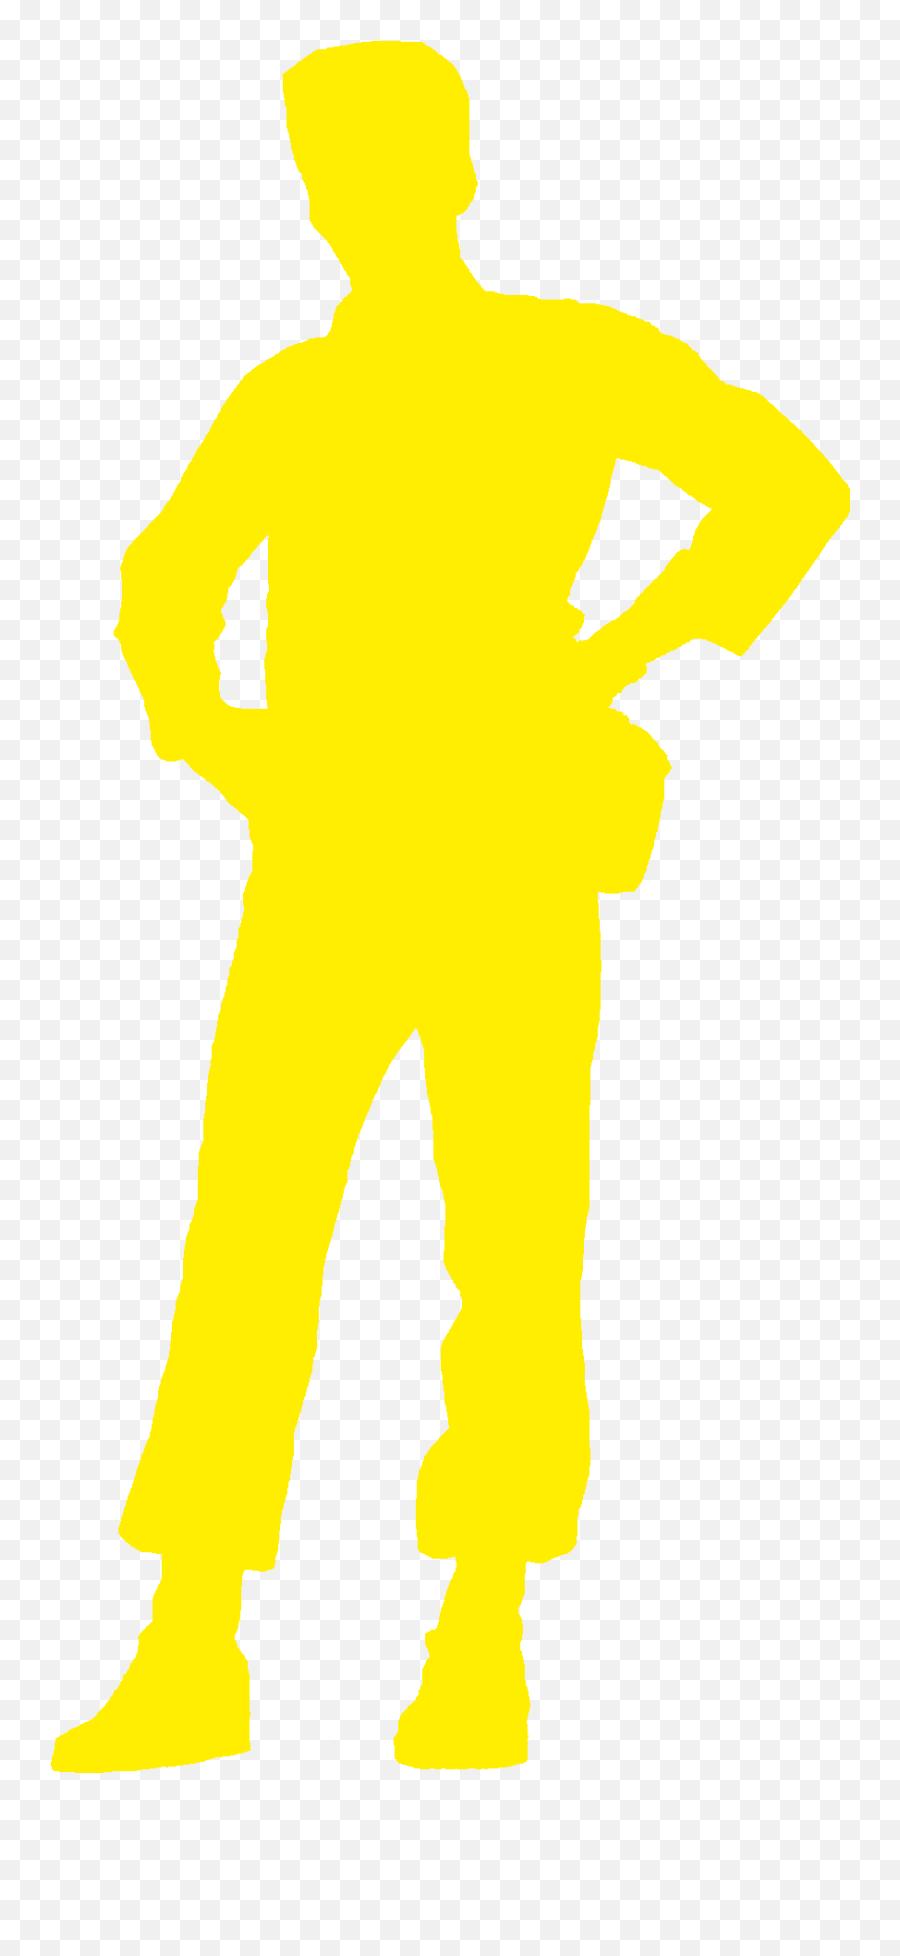 GI Blues Yellow Wall decal Clip art - Elvis Presley png  Clip Art Emoji